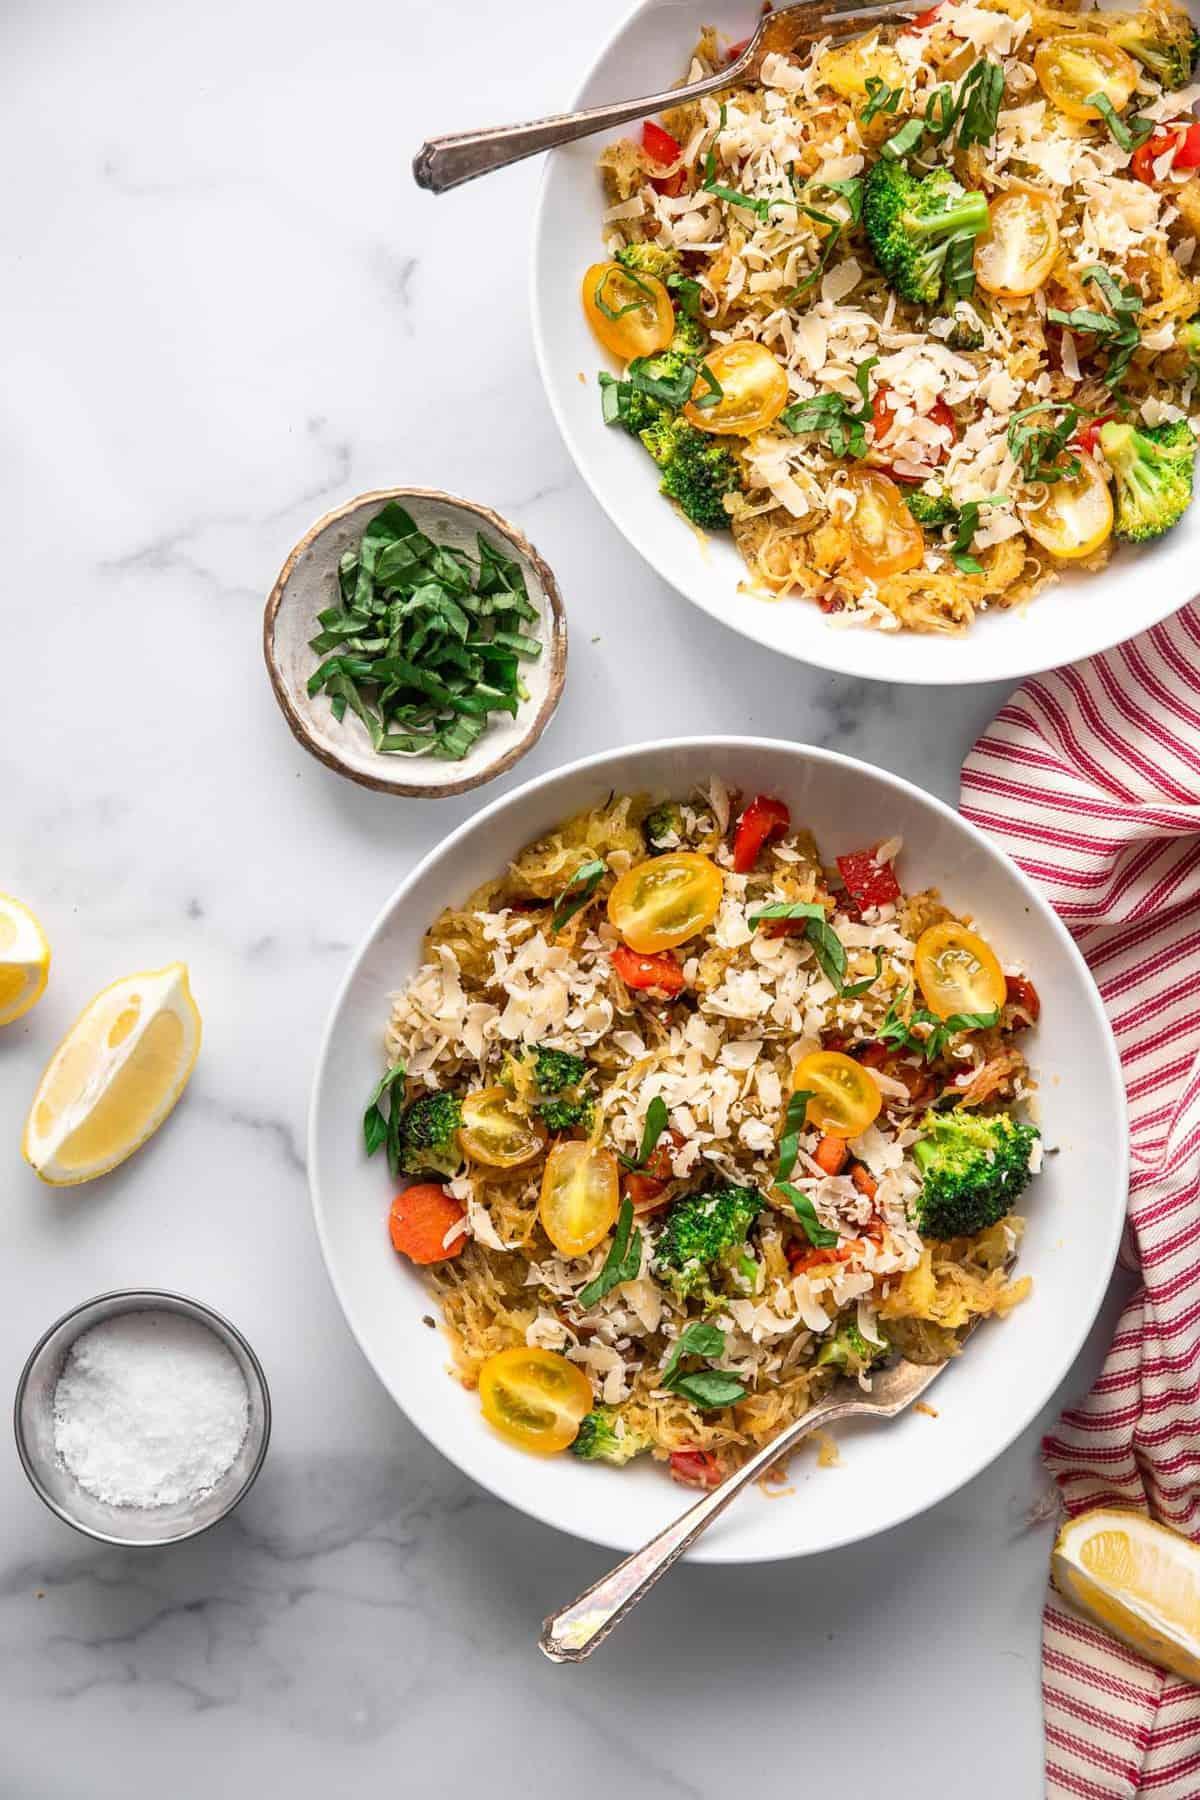 Healthy pasta primavera in a bowl with garnish